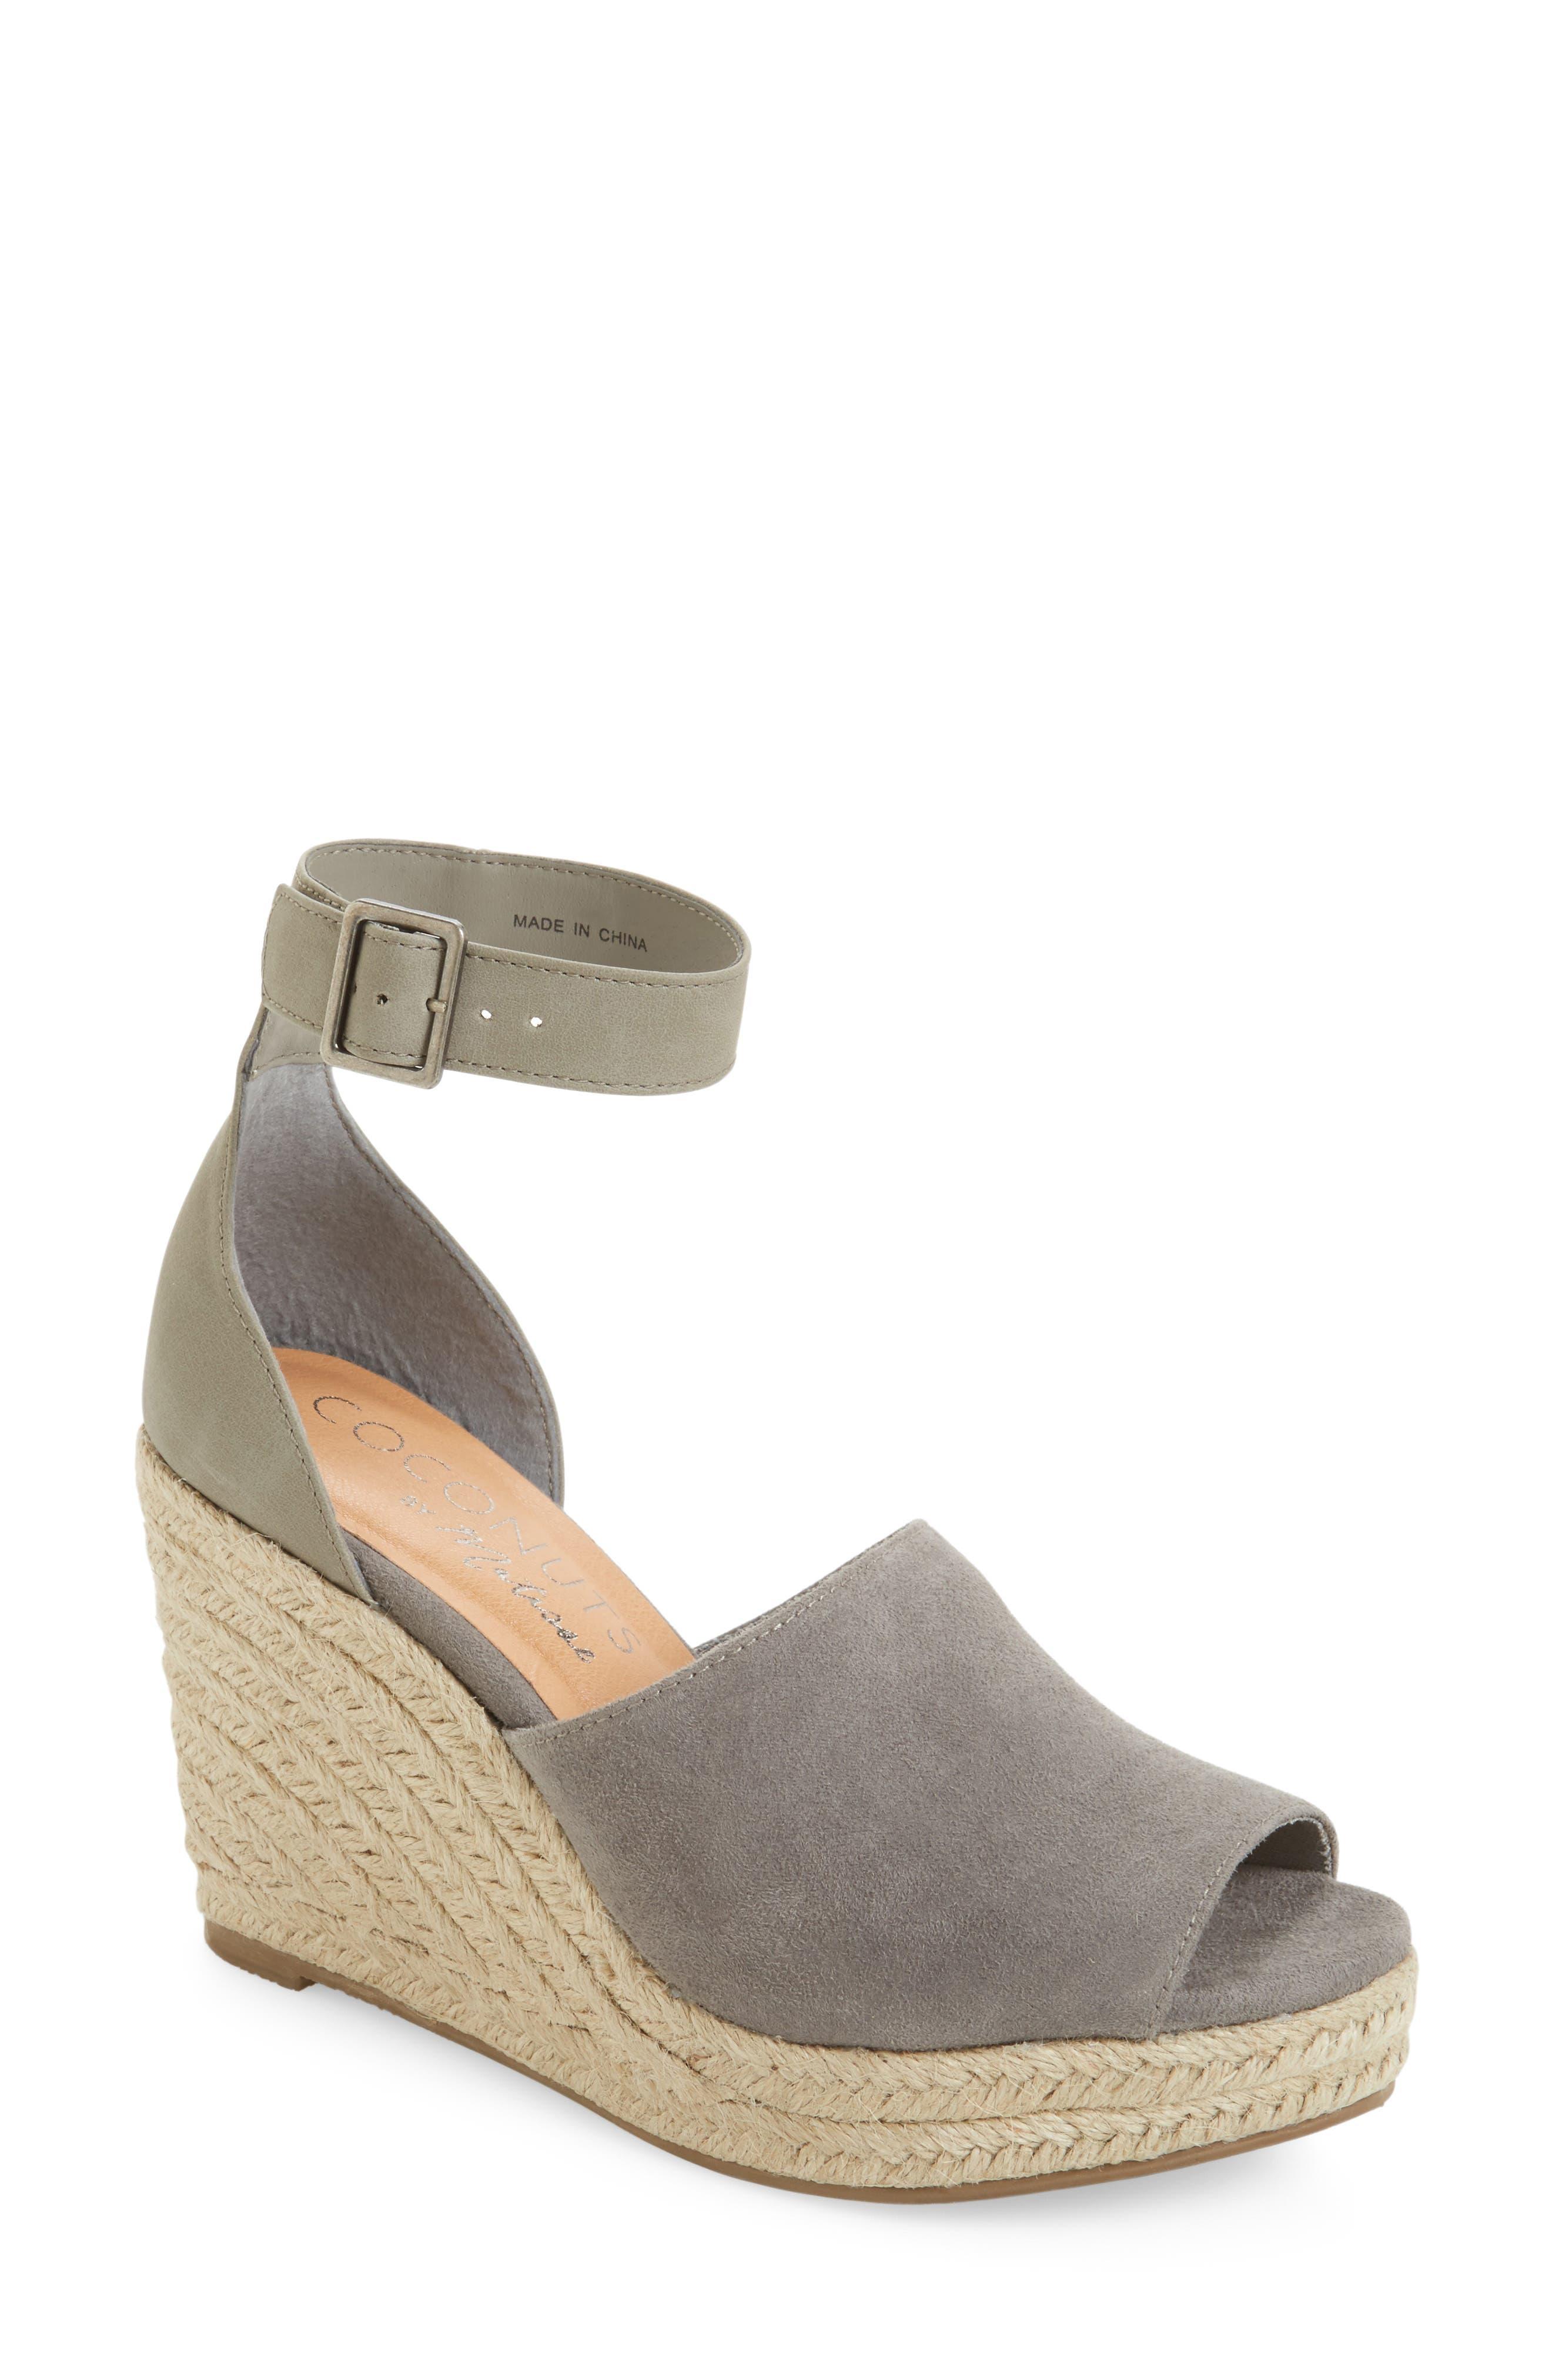 Flamingo Wedge Sandal,                             Main thumbnail 1, color,                             Grey Leather